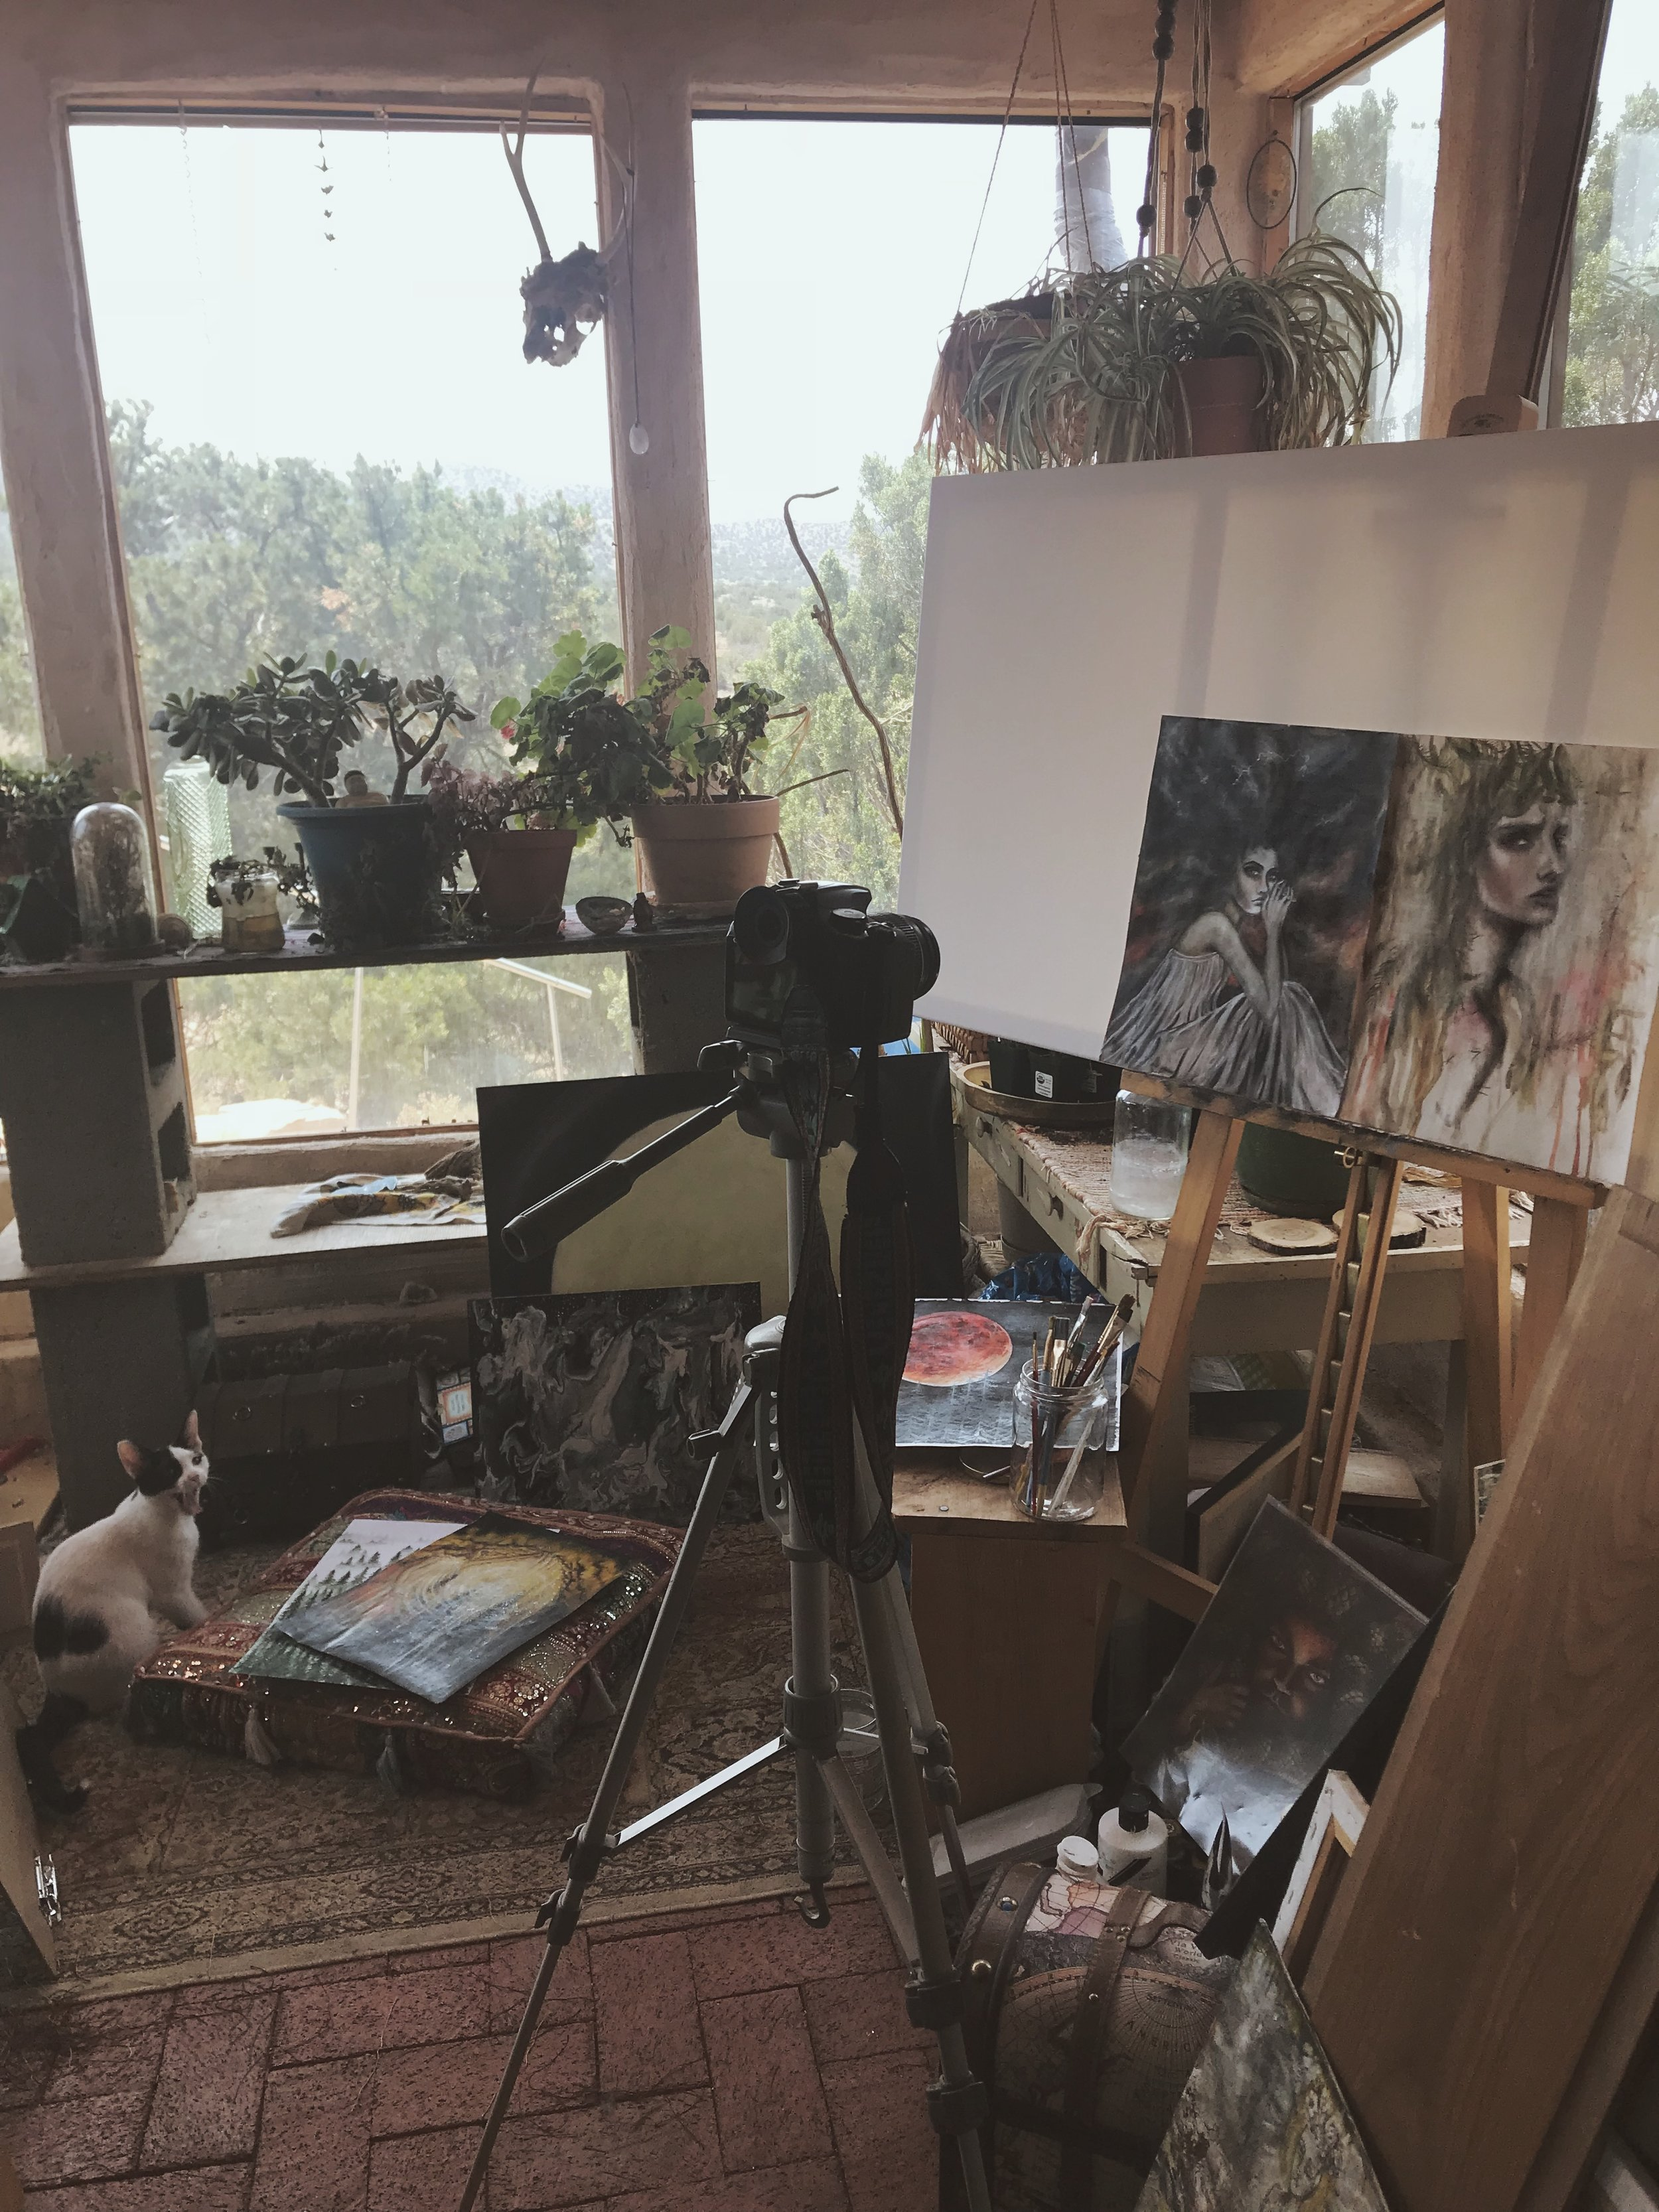 Photographing New Artwork | Tree Talker Art | Shop Update